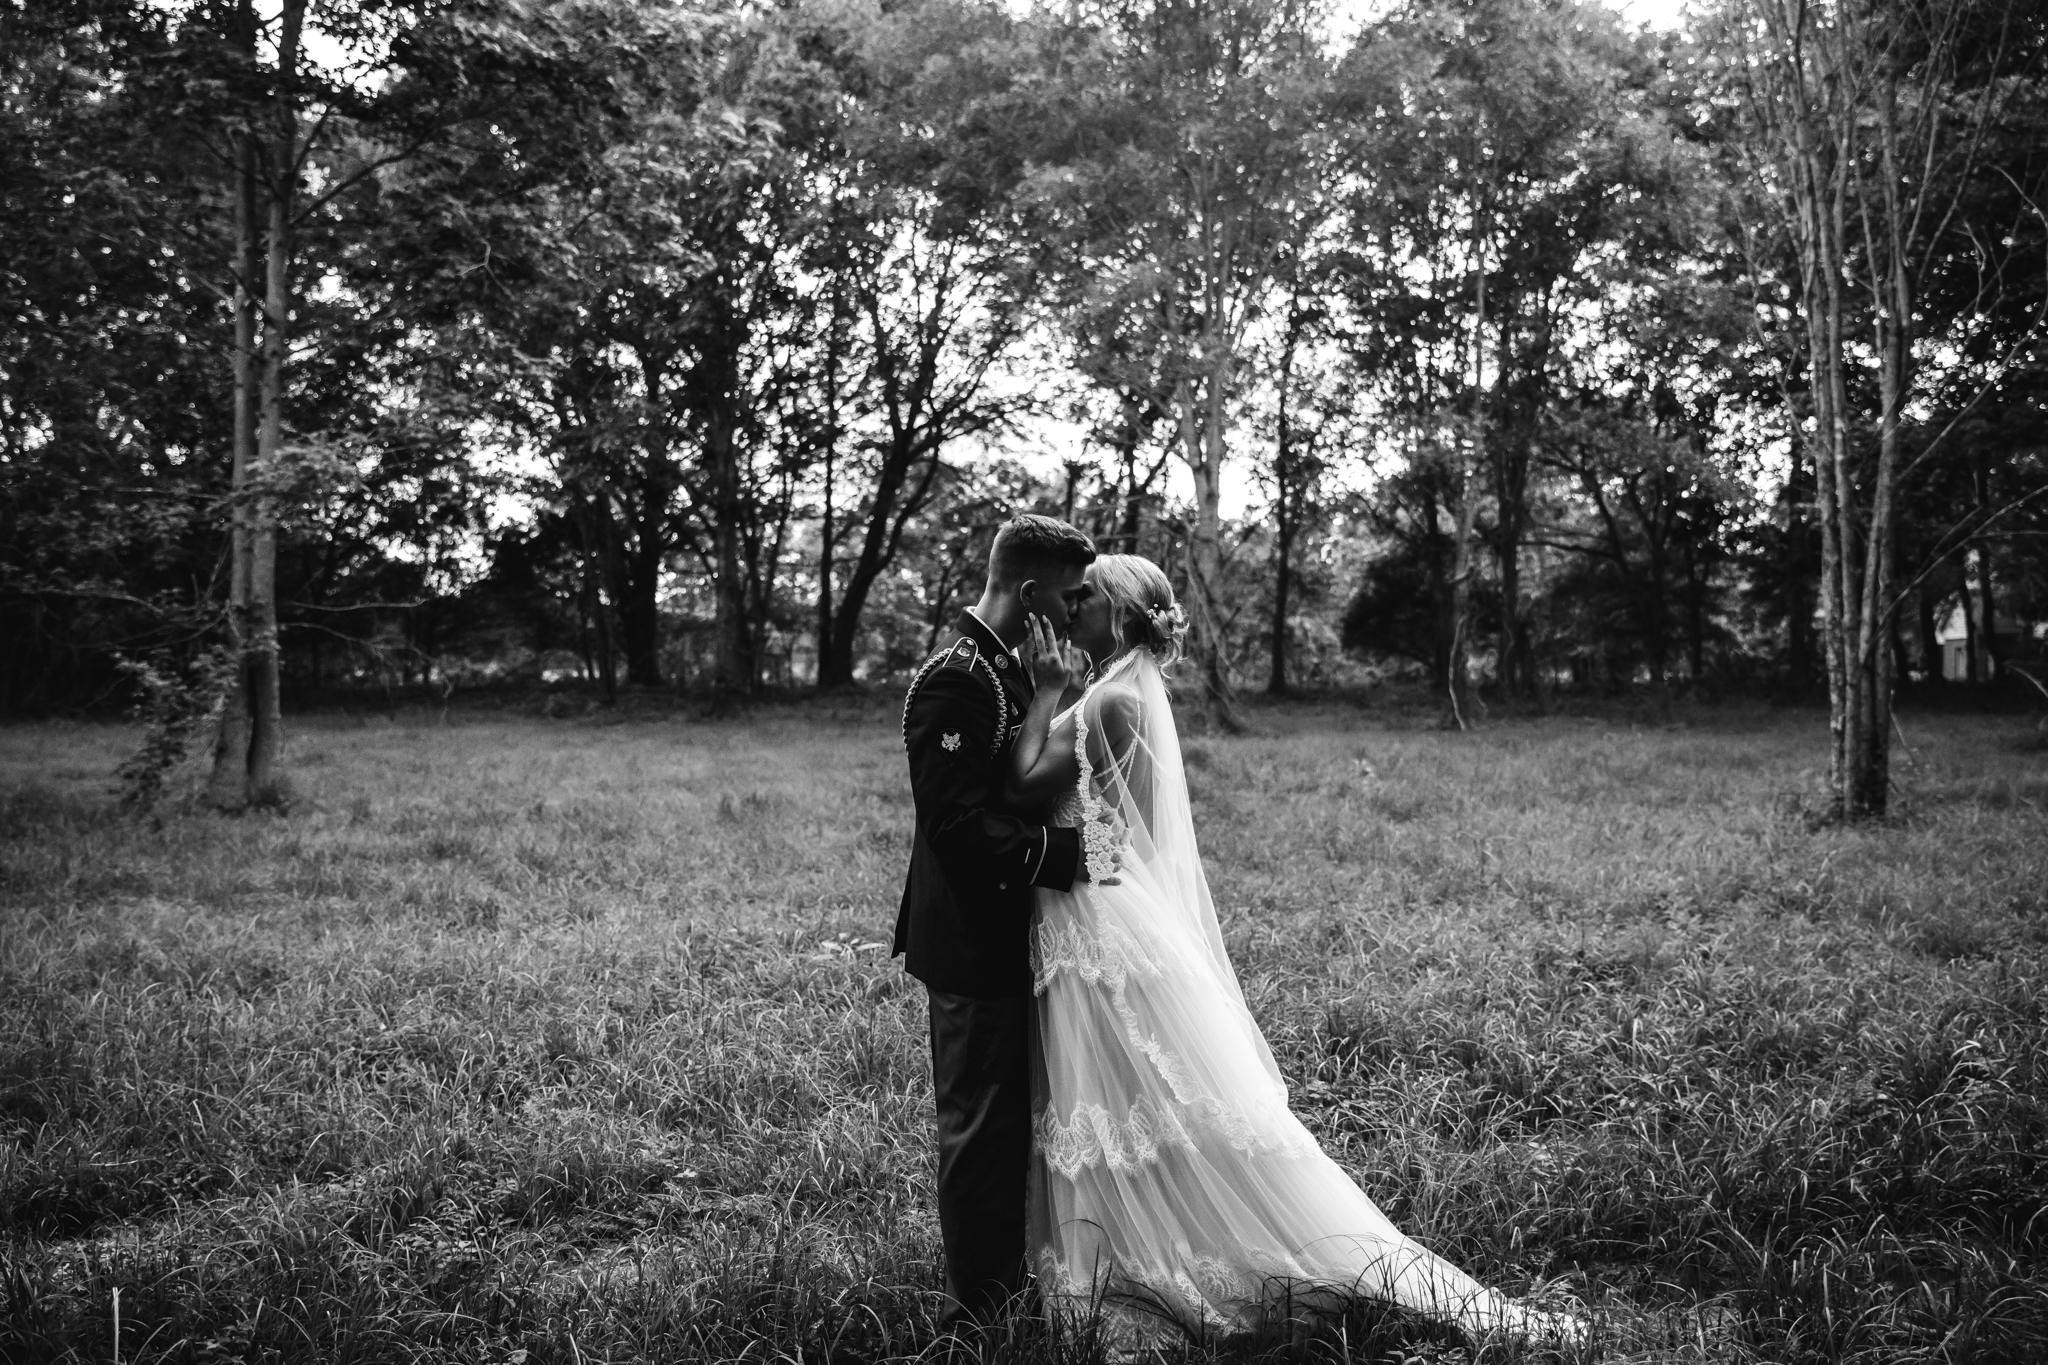 backyard-wedding-thewarmtharoundyou-lexy-branson-79.jpg